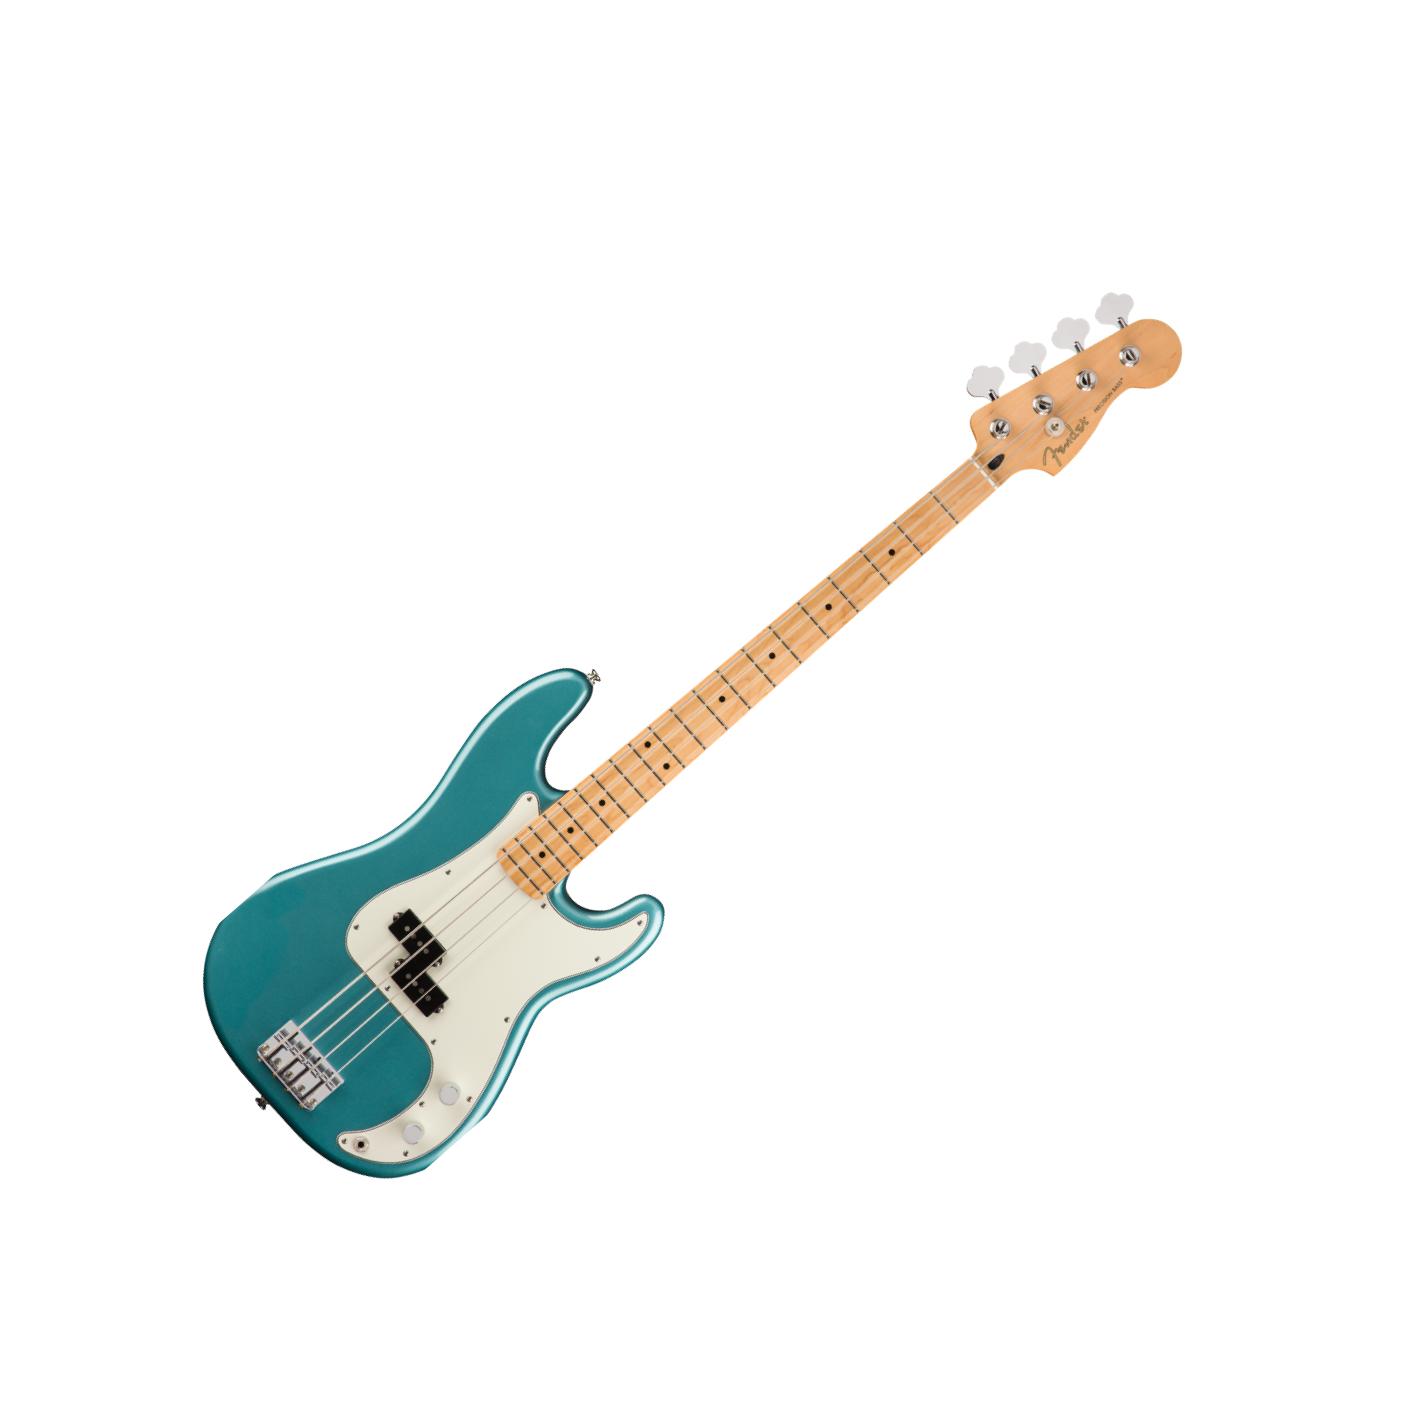 Fender Player P Bass MN Tidepool